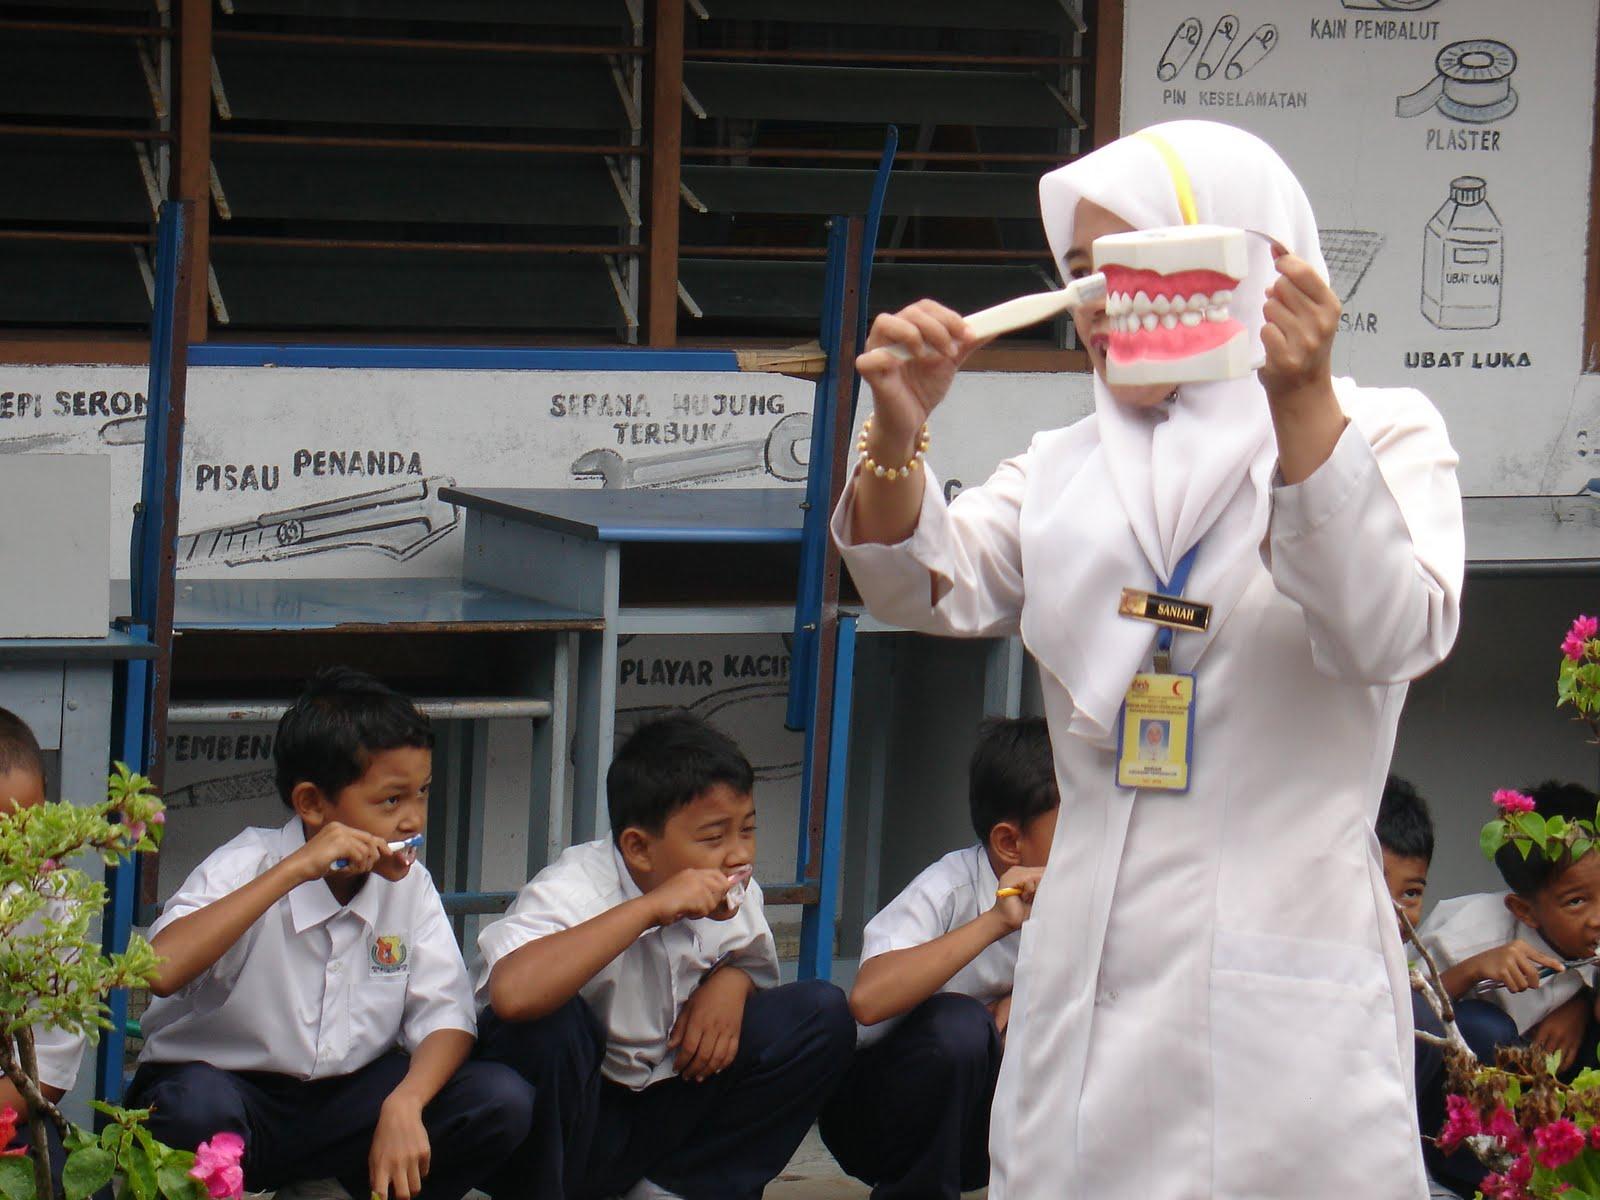 skwb sekolah kebangsaan wakaf bharu kelantan 2015